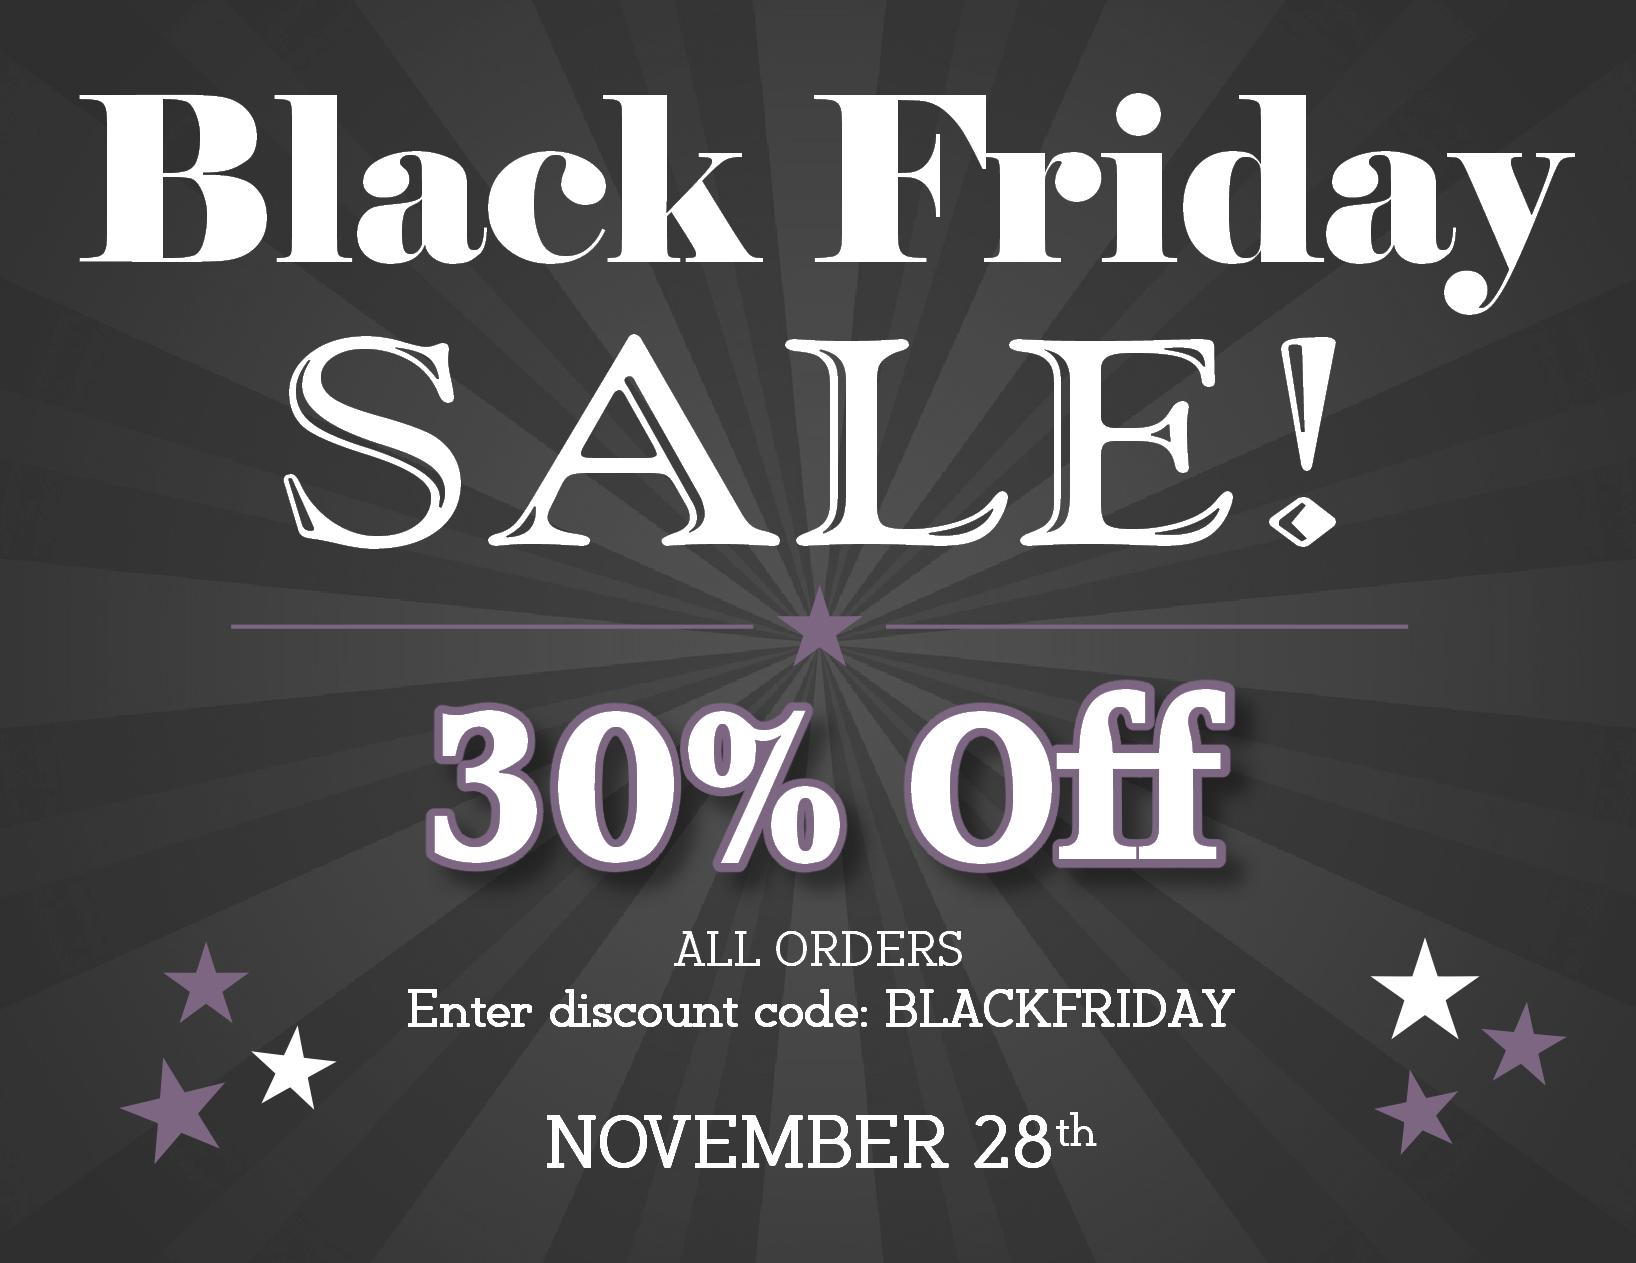 Black Friday SALE! www.sweetessentialsboutique.com